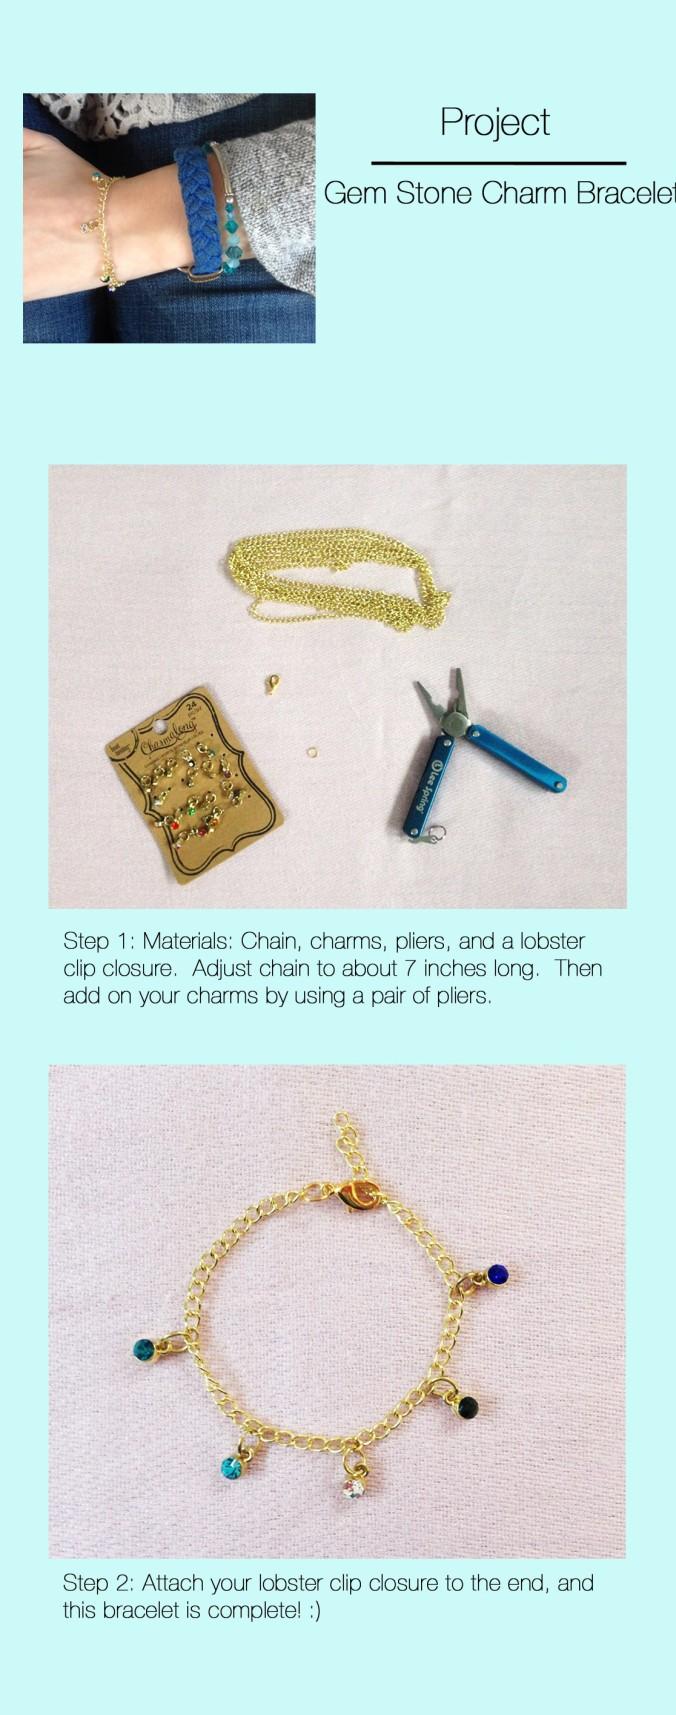 Gem Stone Charm Bracelet